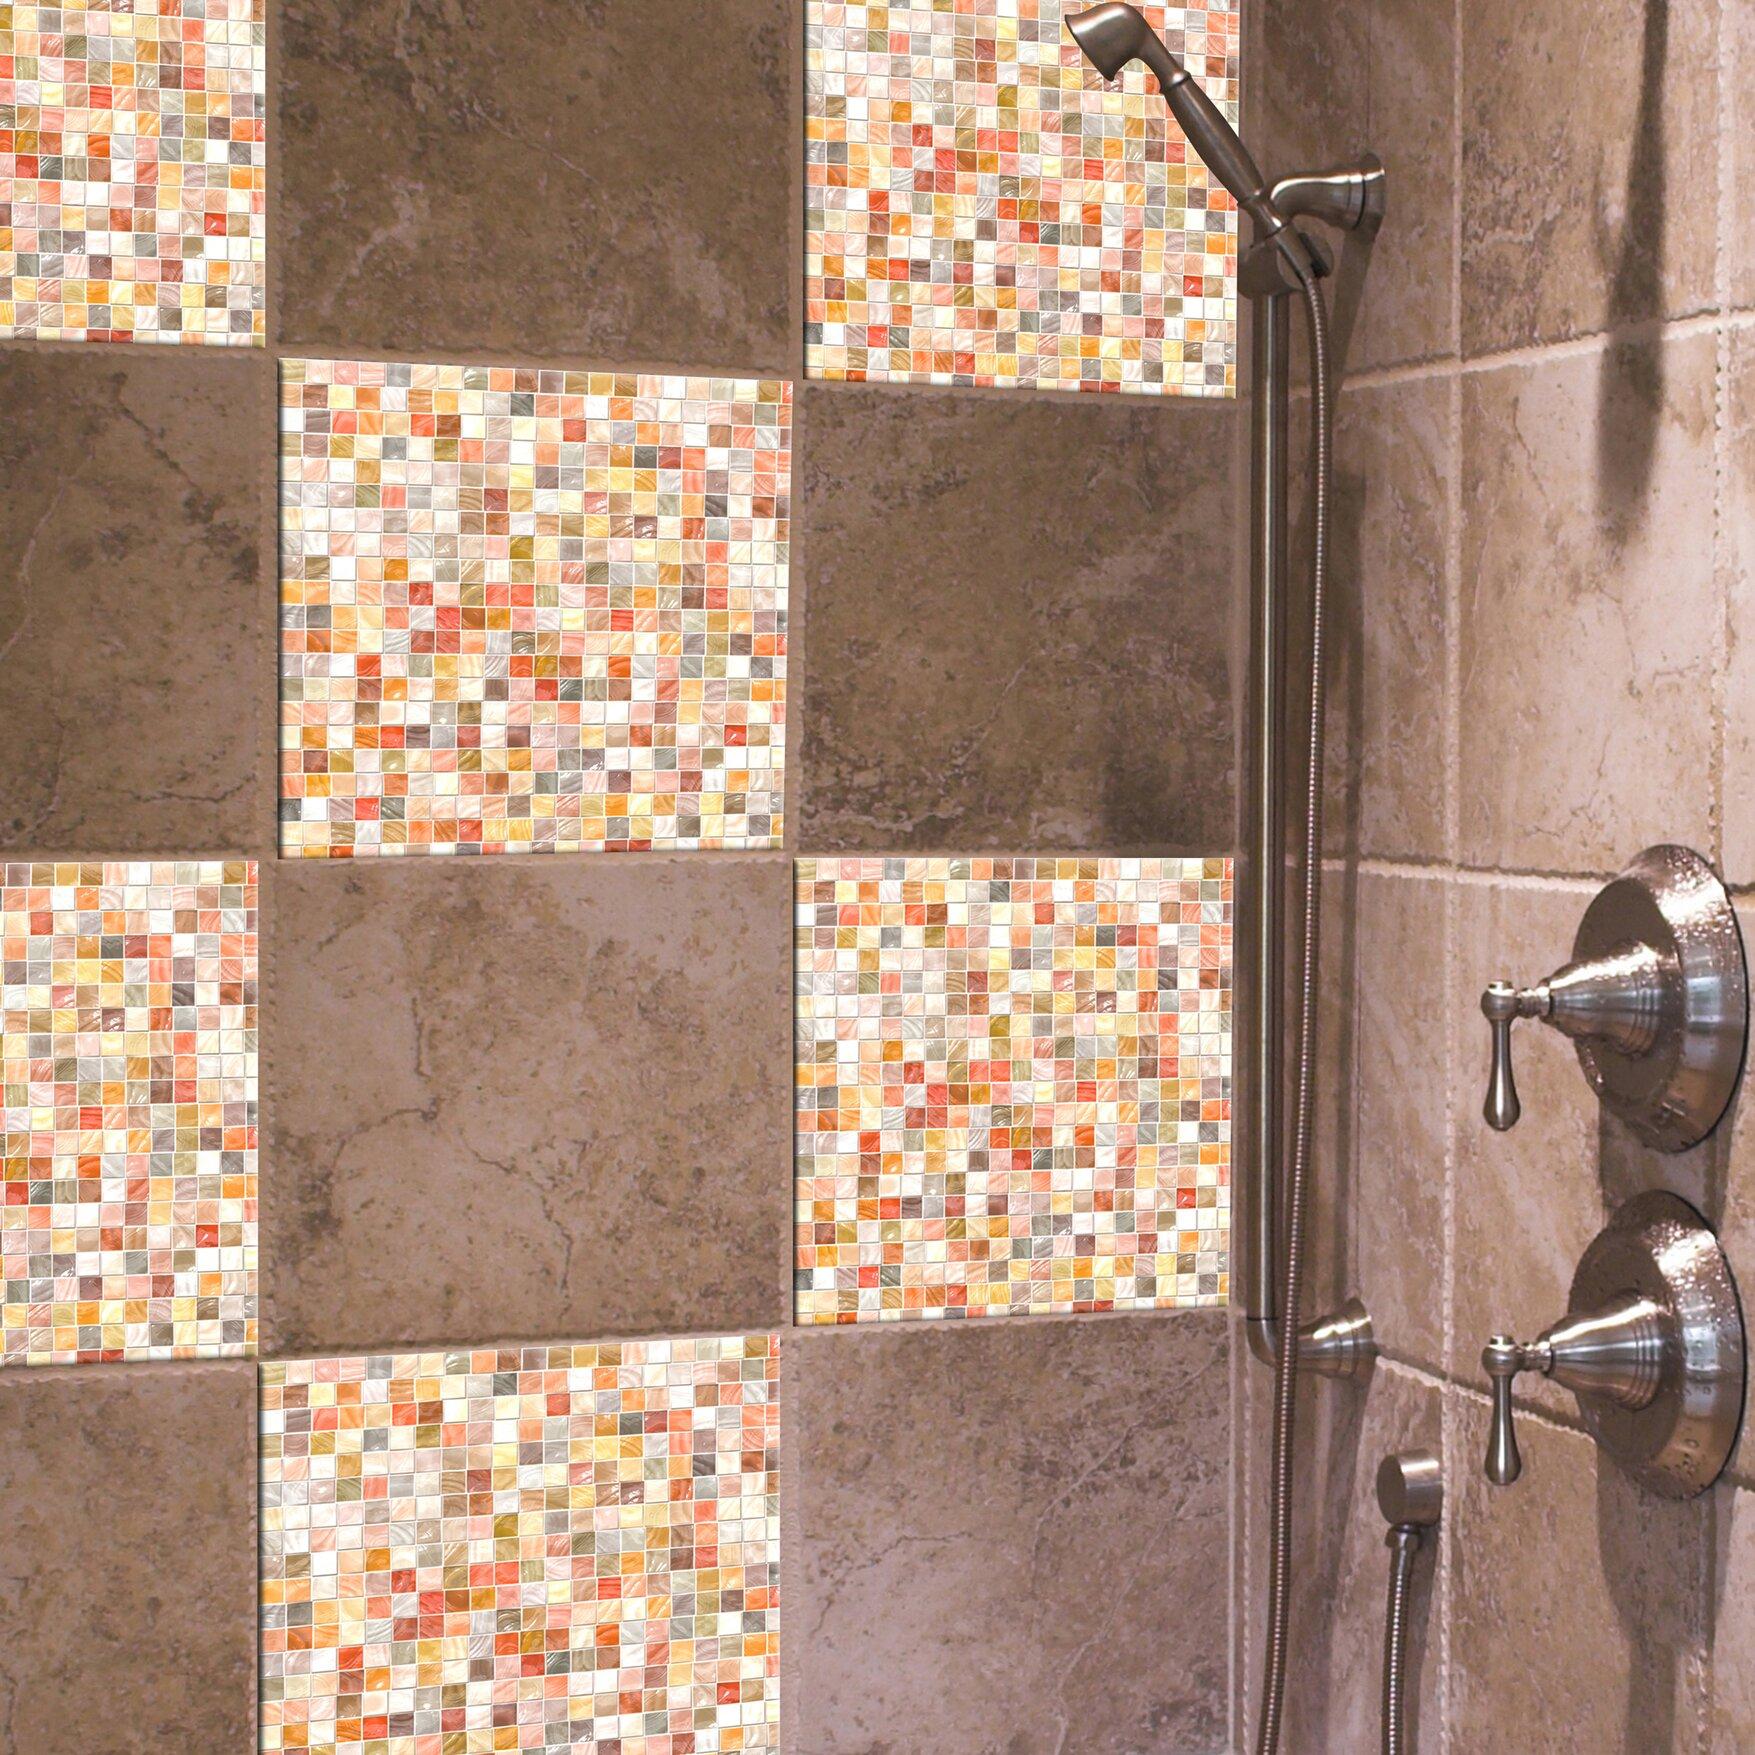 wallpops home decor line 7 9 x 7 9 ceramic peel stick mosaic tile in pearl reviews wayfair. Black Bedroom Furniture Sets. Home Design Ideas